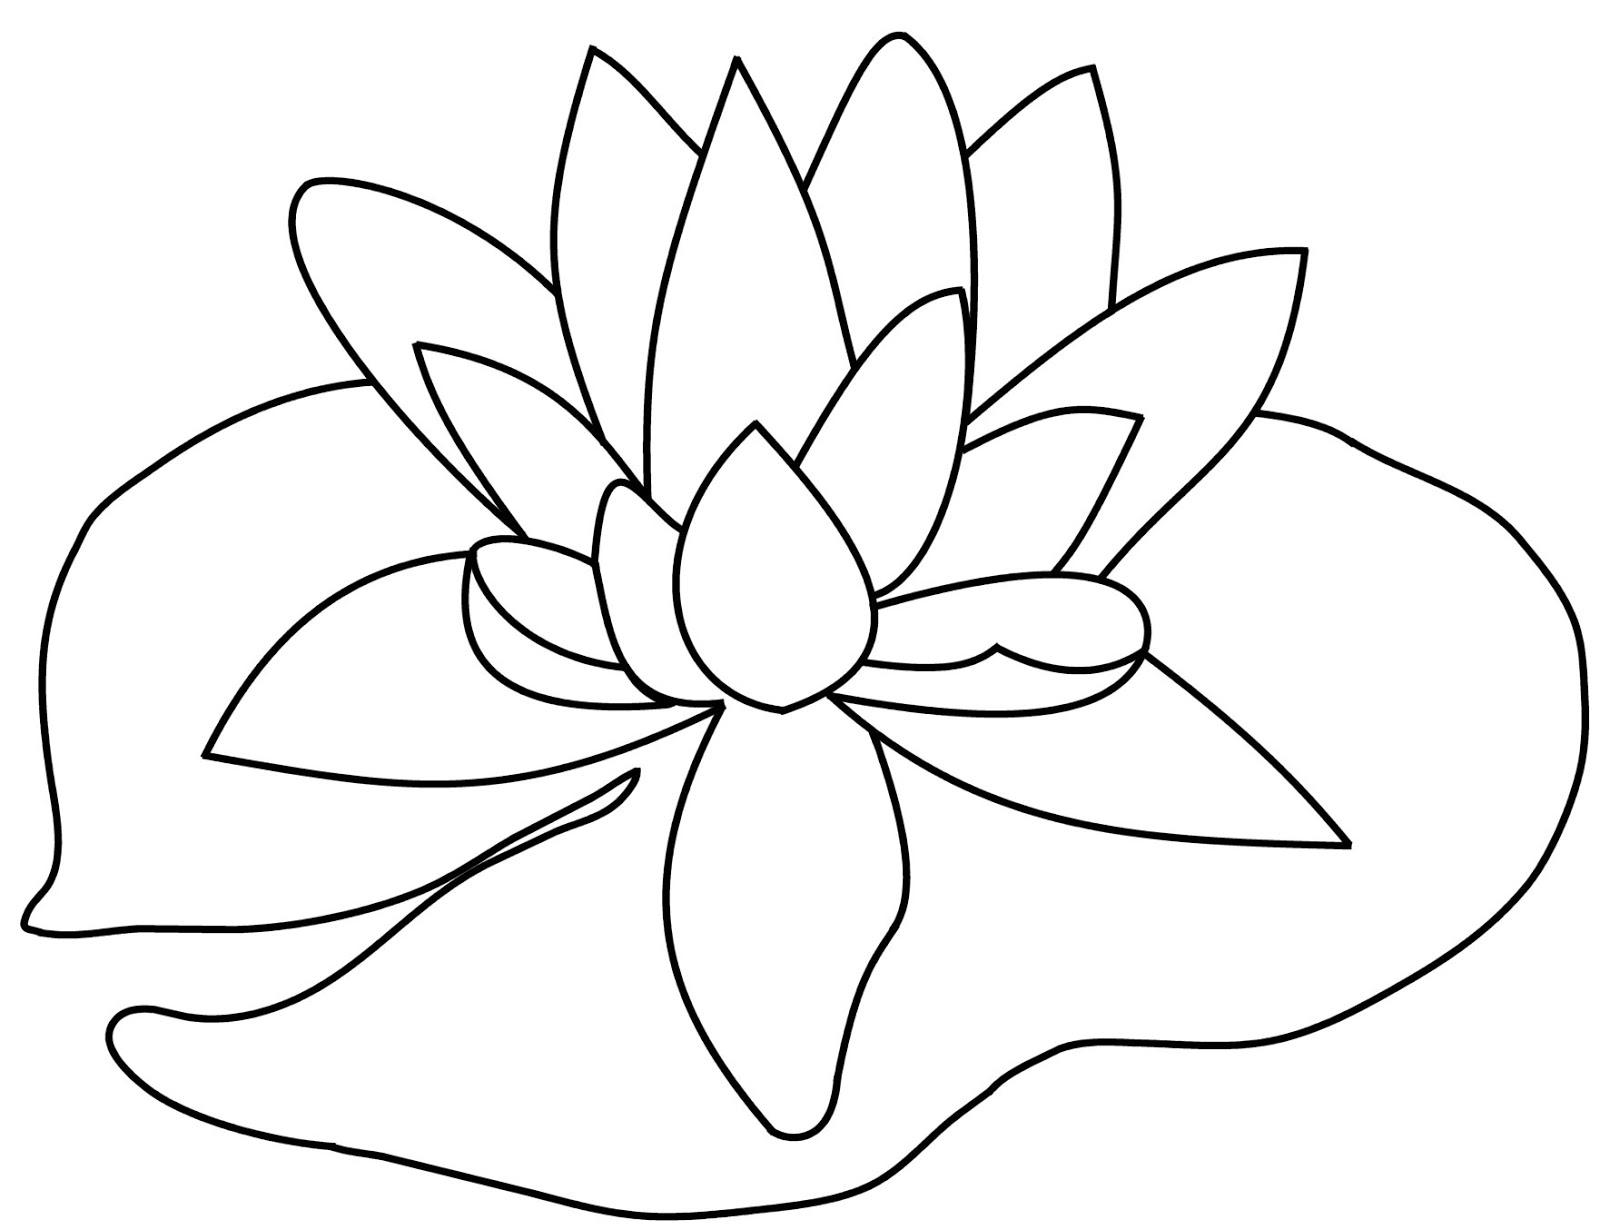 http://1.bp.blogspot.com/-ba5lY2K6Pxg/VAak8WKnpiI/AAAAAAAAK3w/1YavWmLTmfI/s1600/Lily%2BPad.jpg